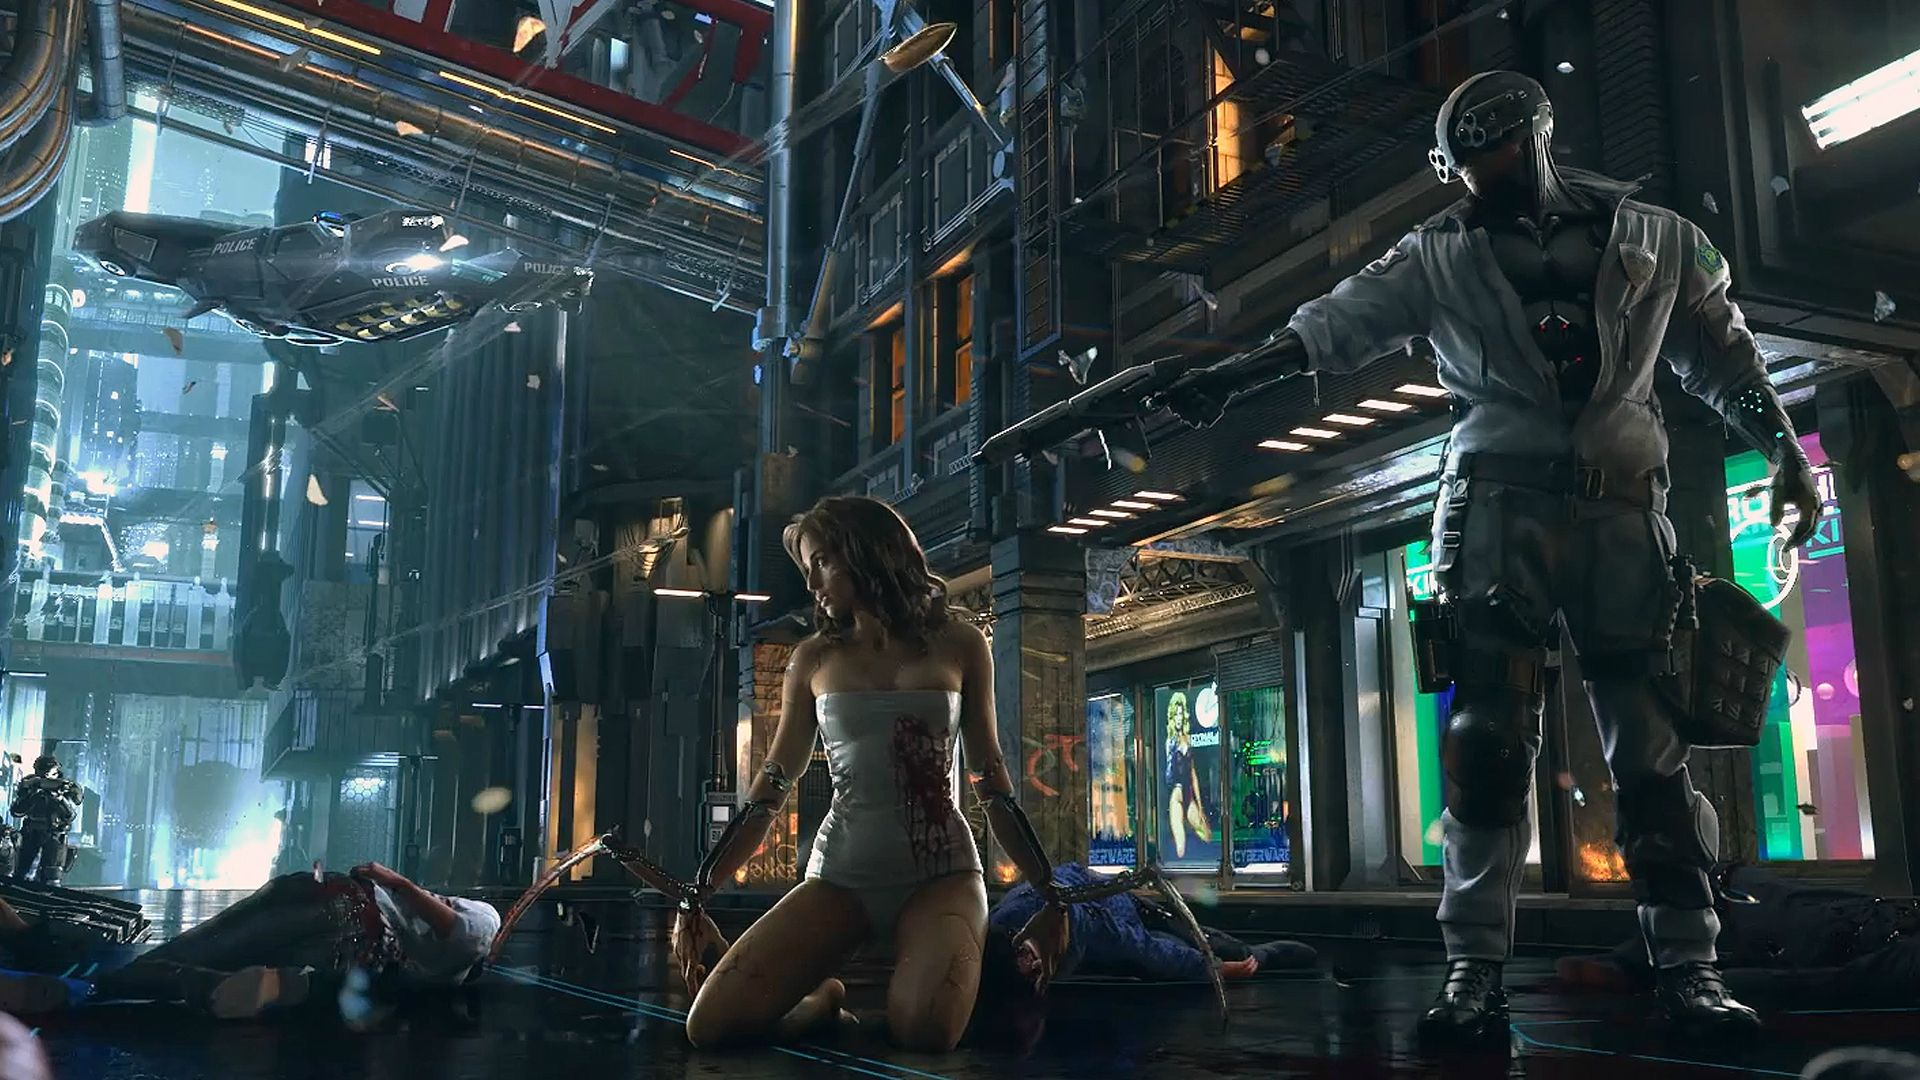 cyberpunk_2077_teoria_ciri_the_witcher_generacion_xbox